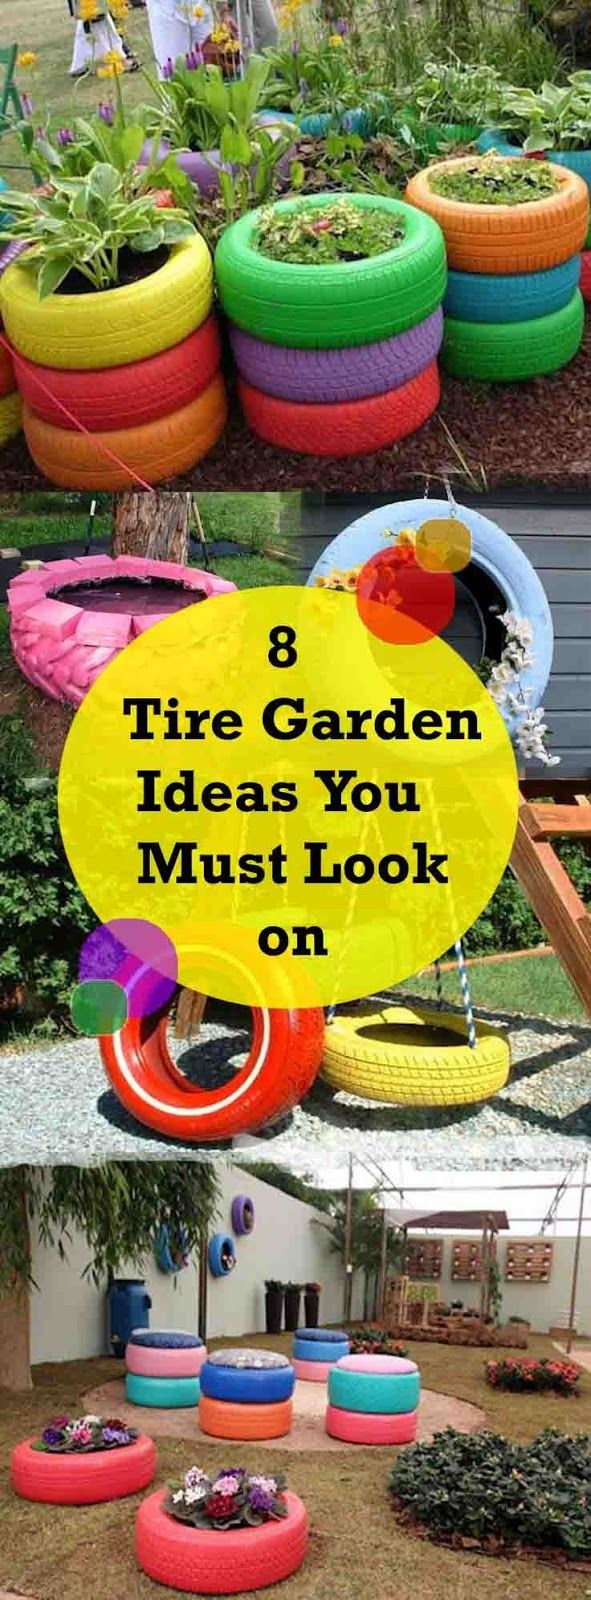 102347 Best Great Gardens Ideas Images On Pinterest